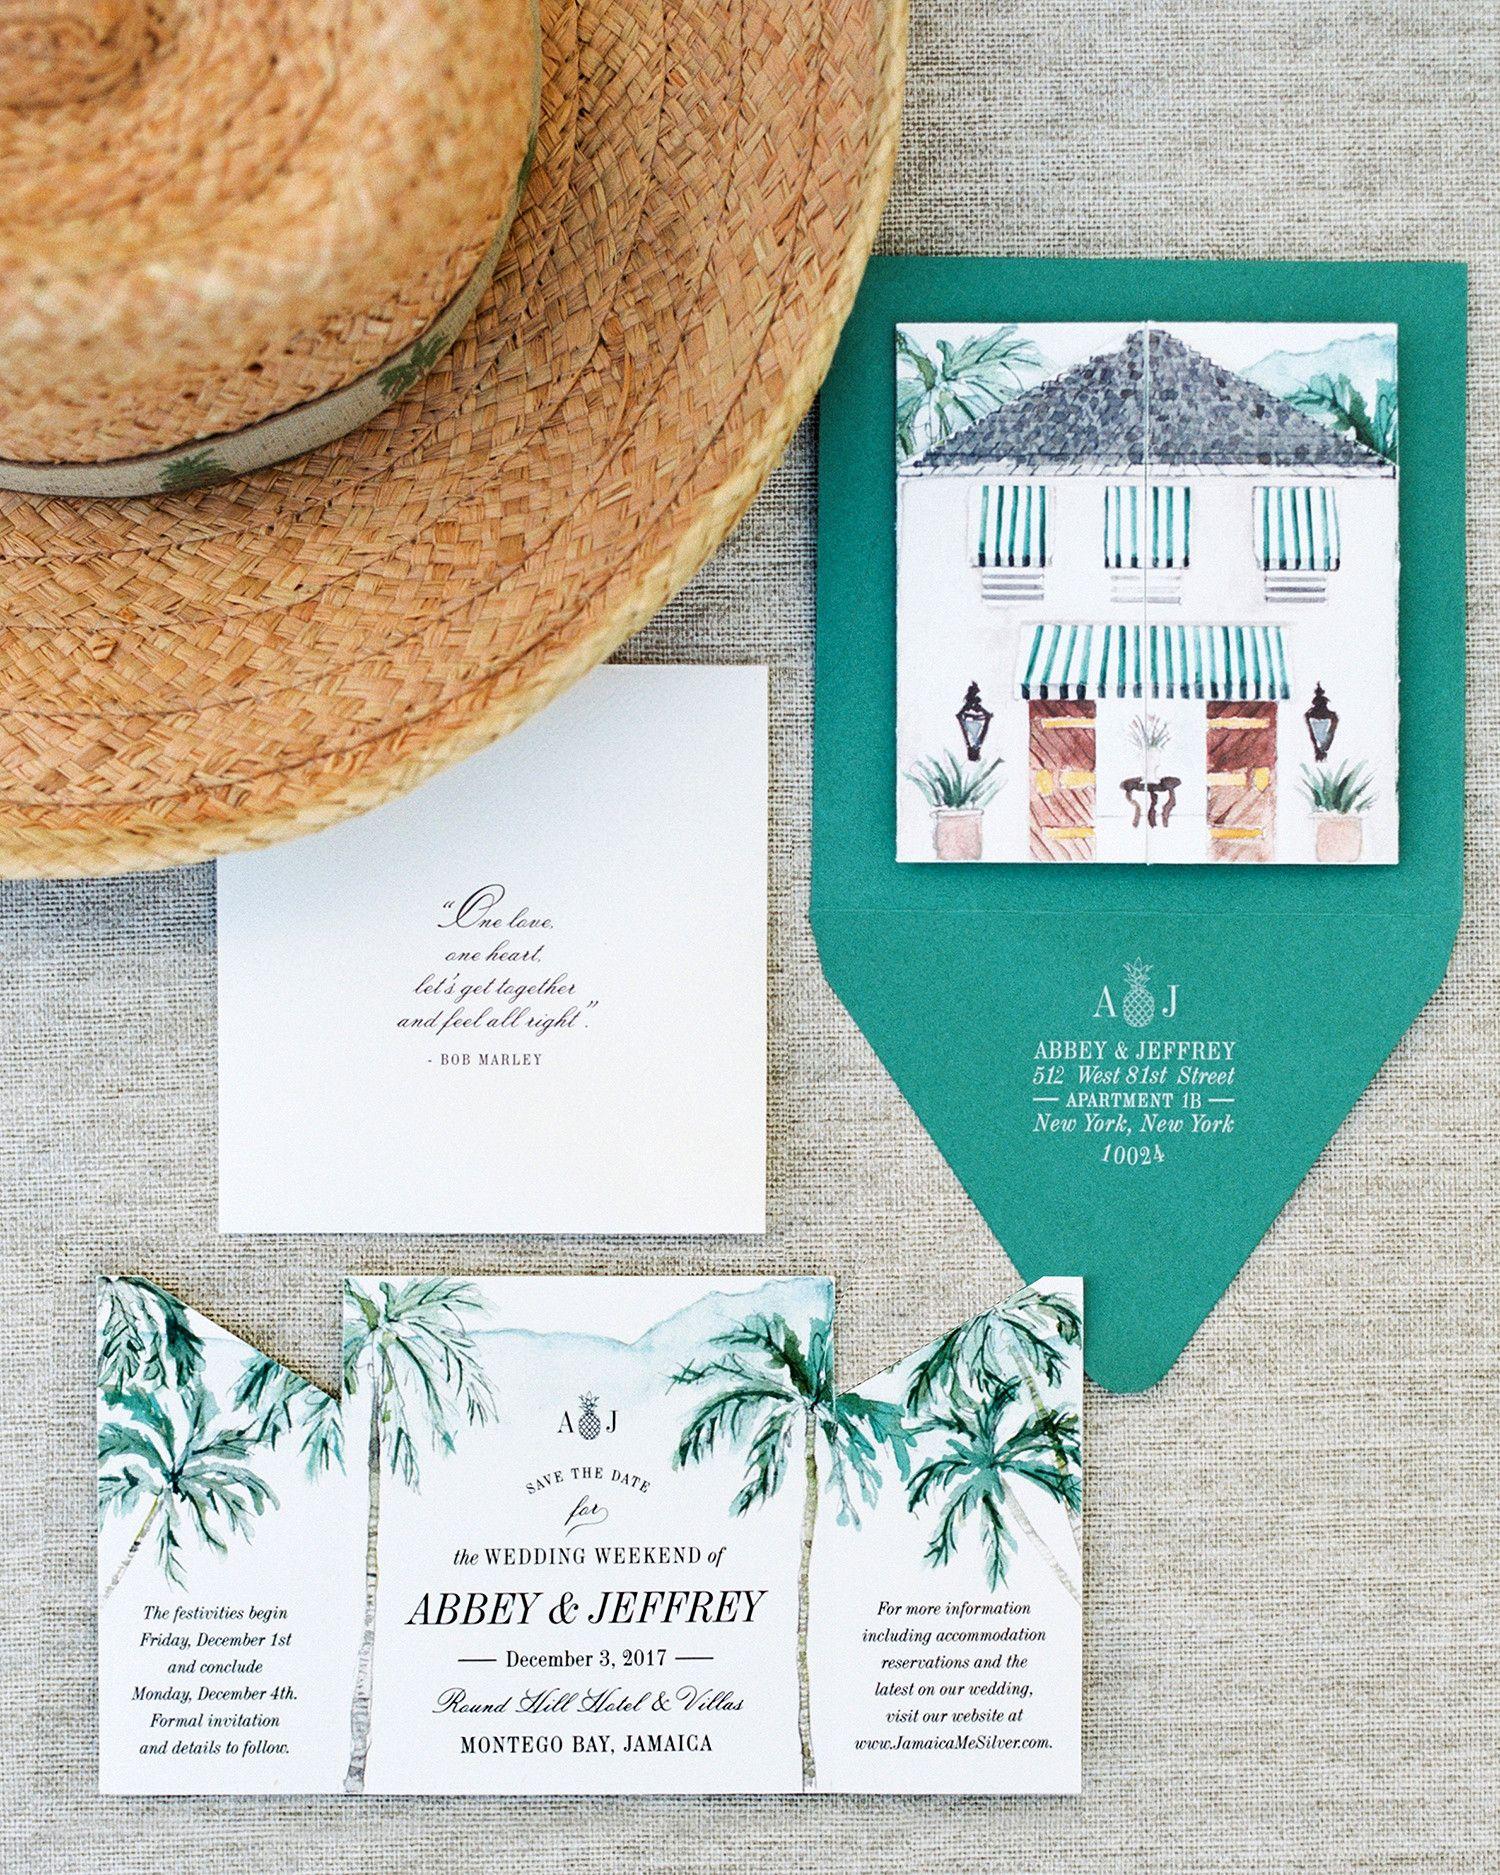 Palm Prints And Stripes Set The Tone For This Couple S Destination Wedding In Jamaica Wedding Saving Tropical Wedding Wedding